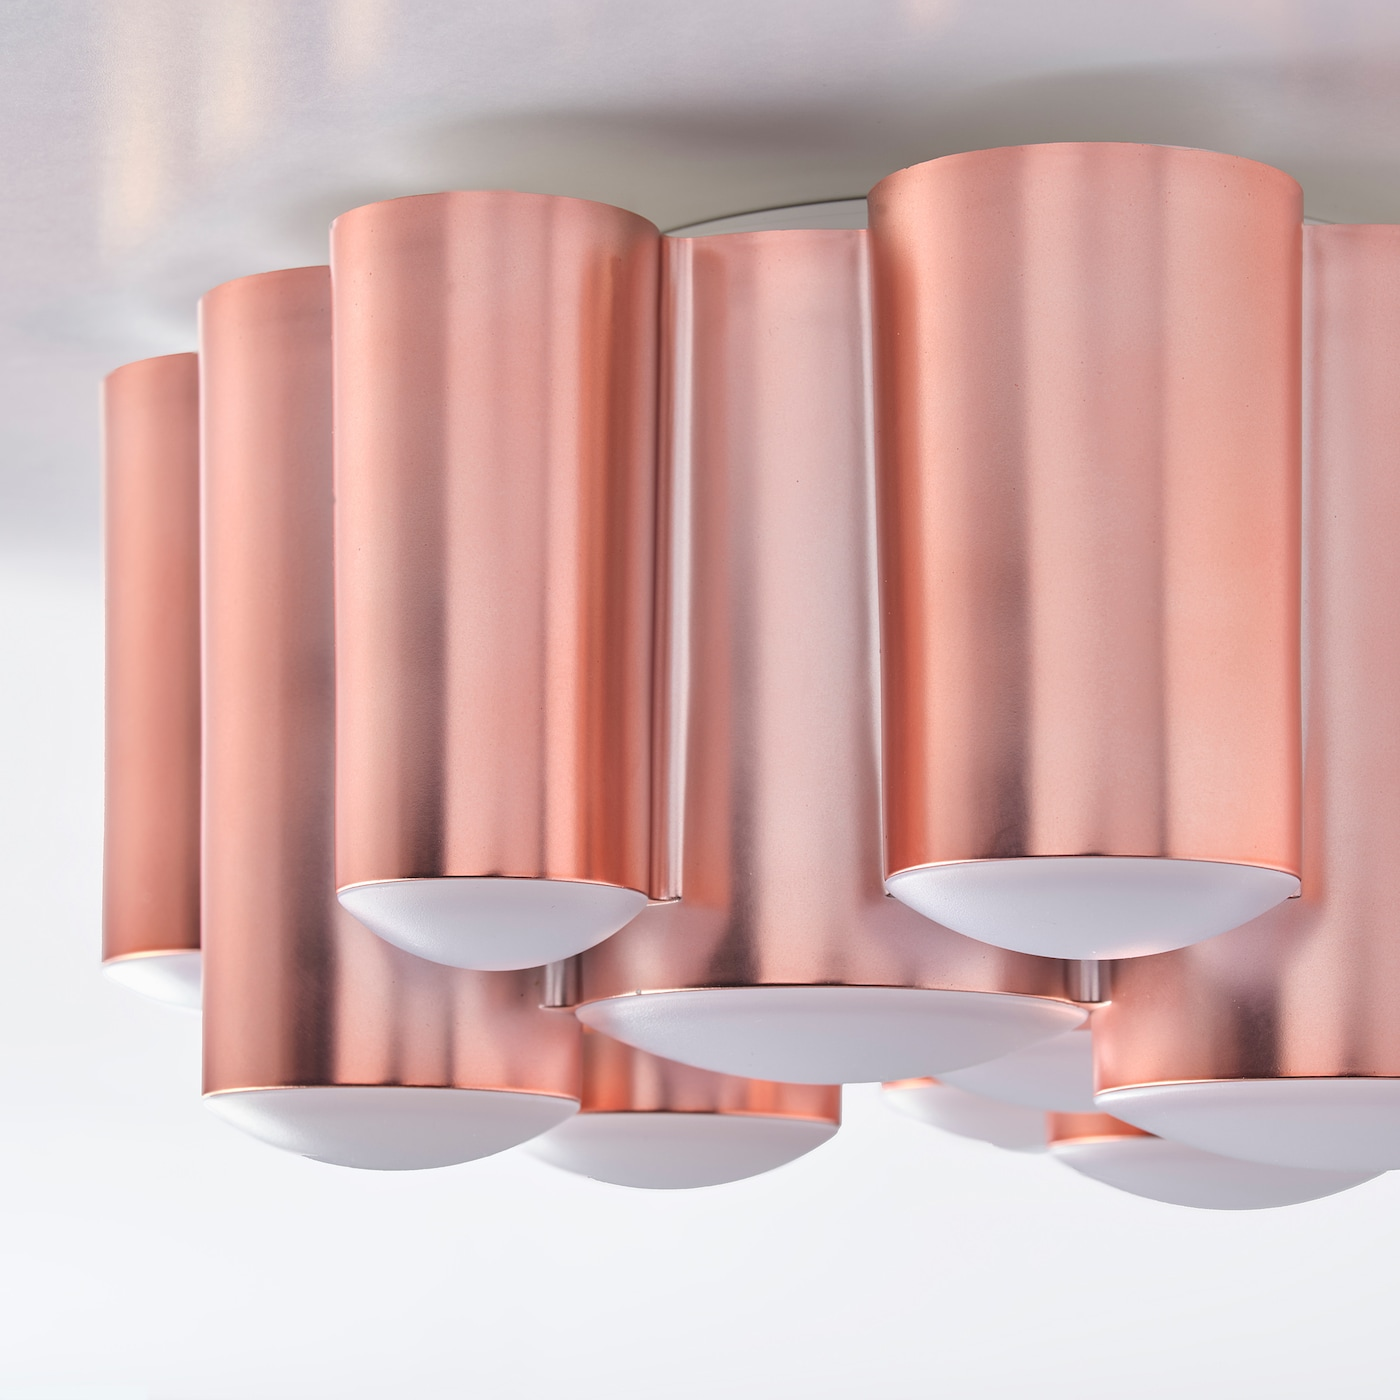 SÖDERSVIK Deckenleuchte, LED rosamattiert 21 cm